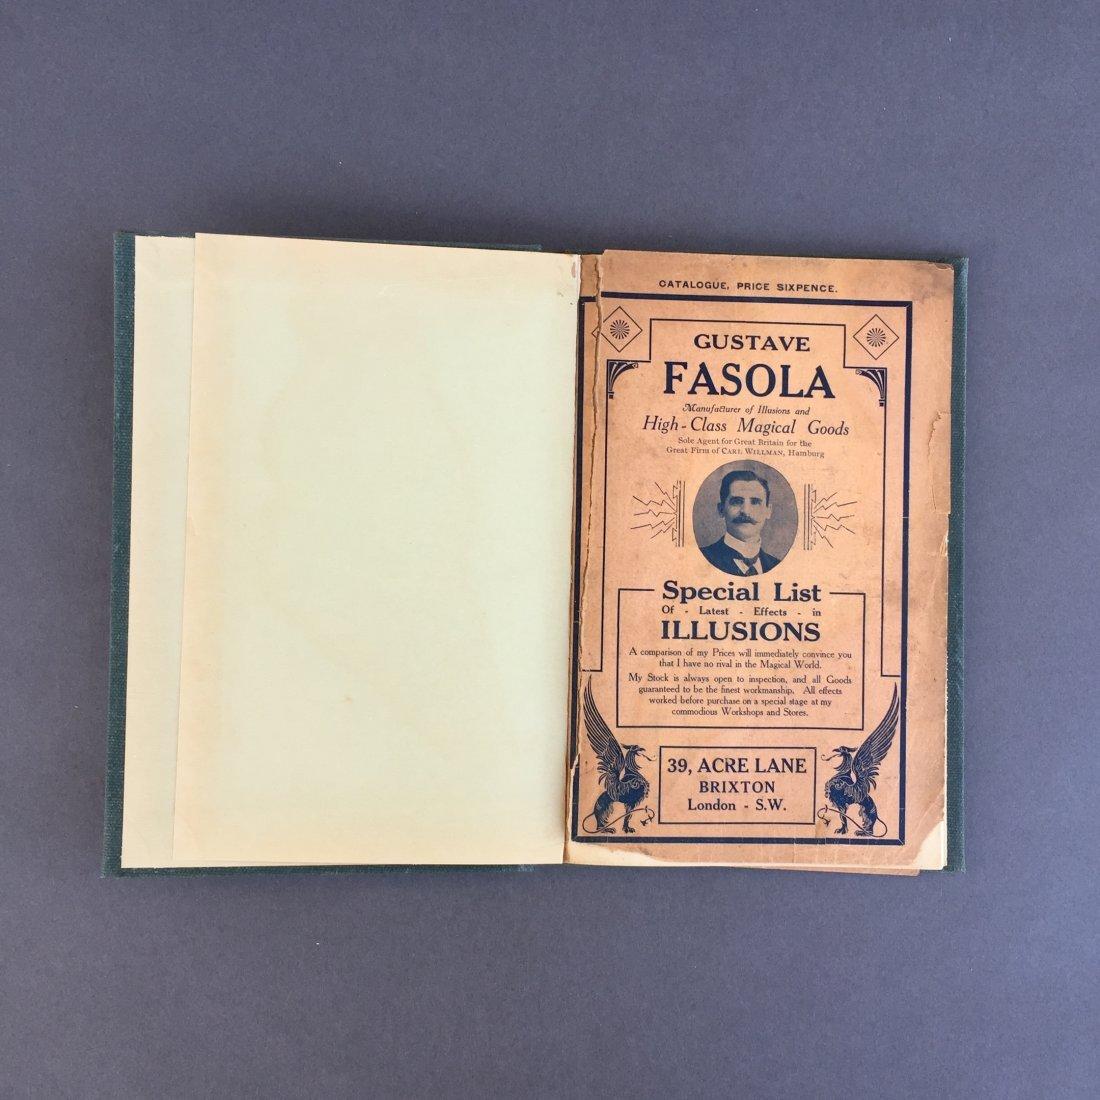 Gustave Fasola 1890